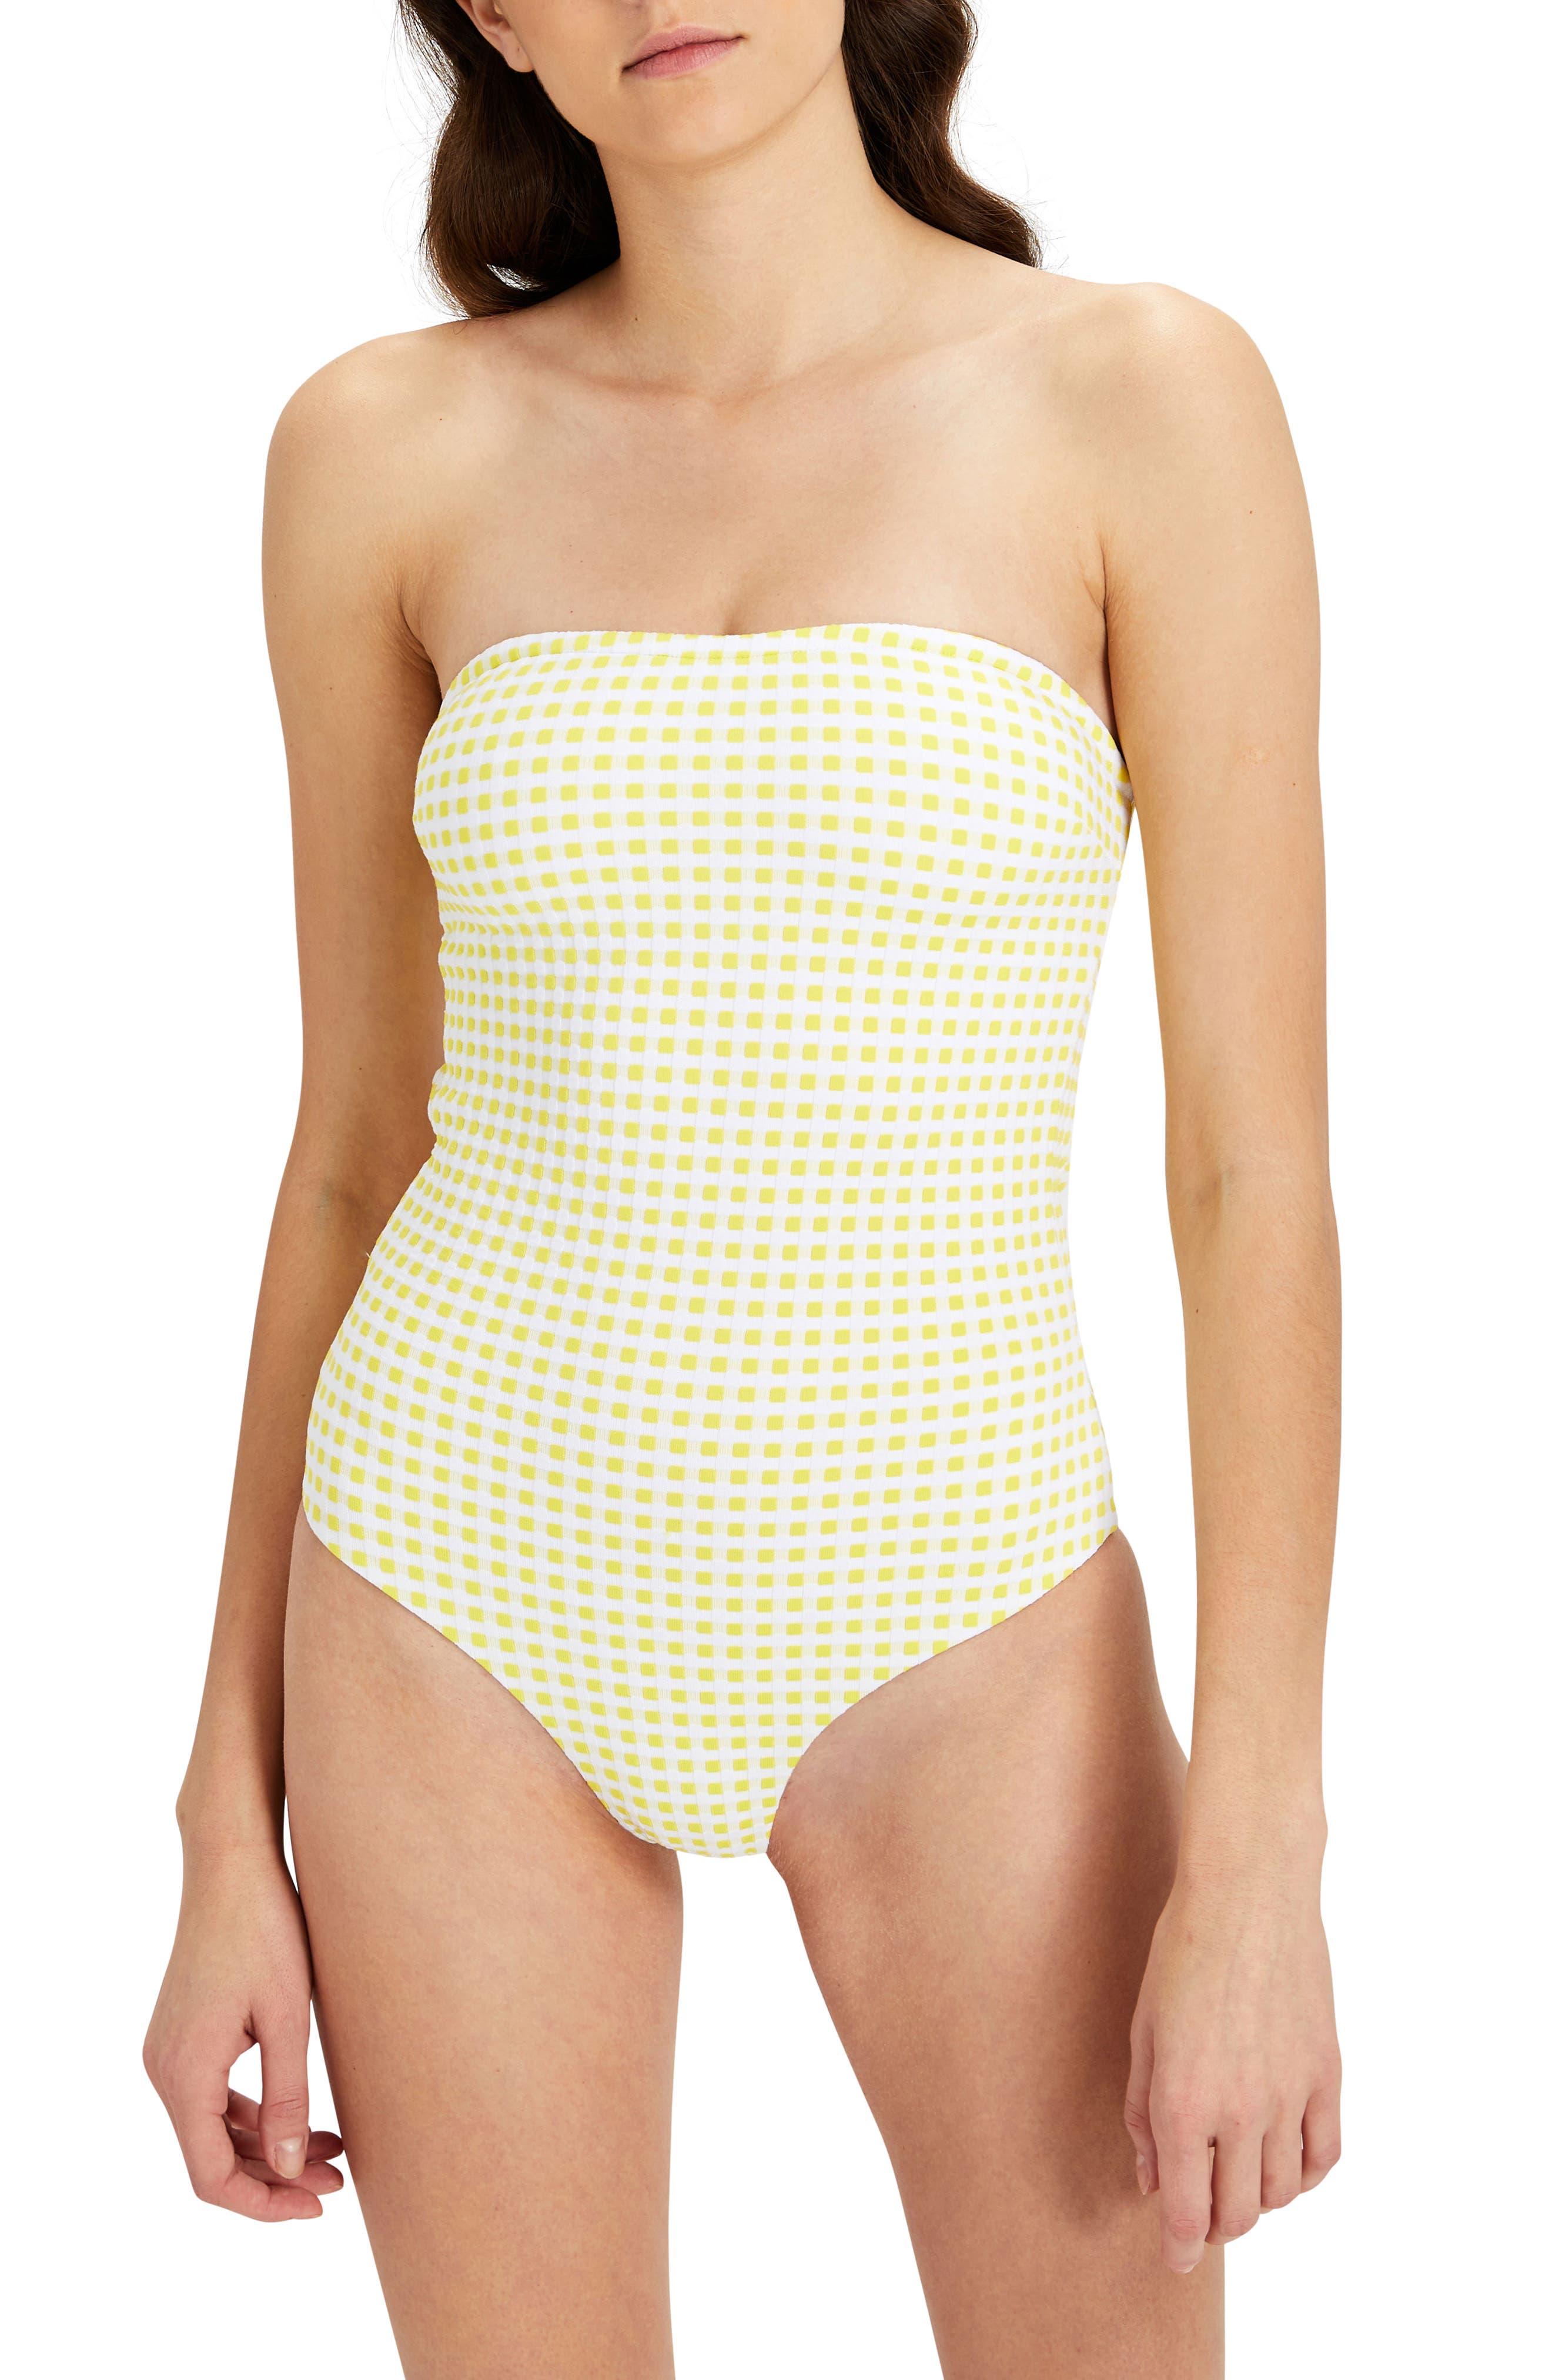 Main Image - Onia Estelle Convertible One-Piece Swimsuit